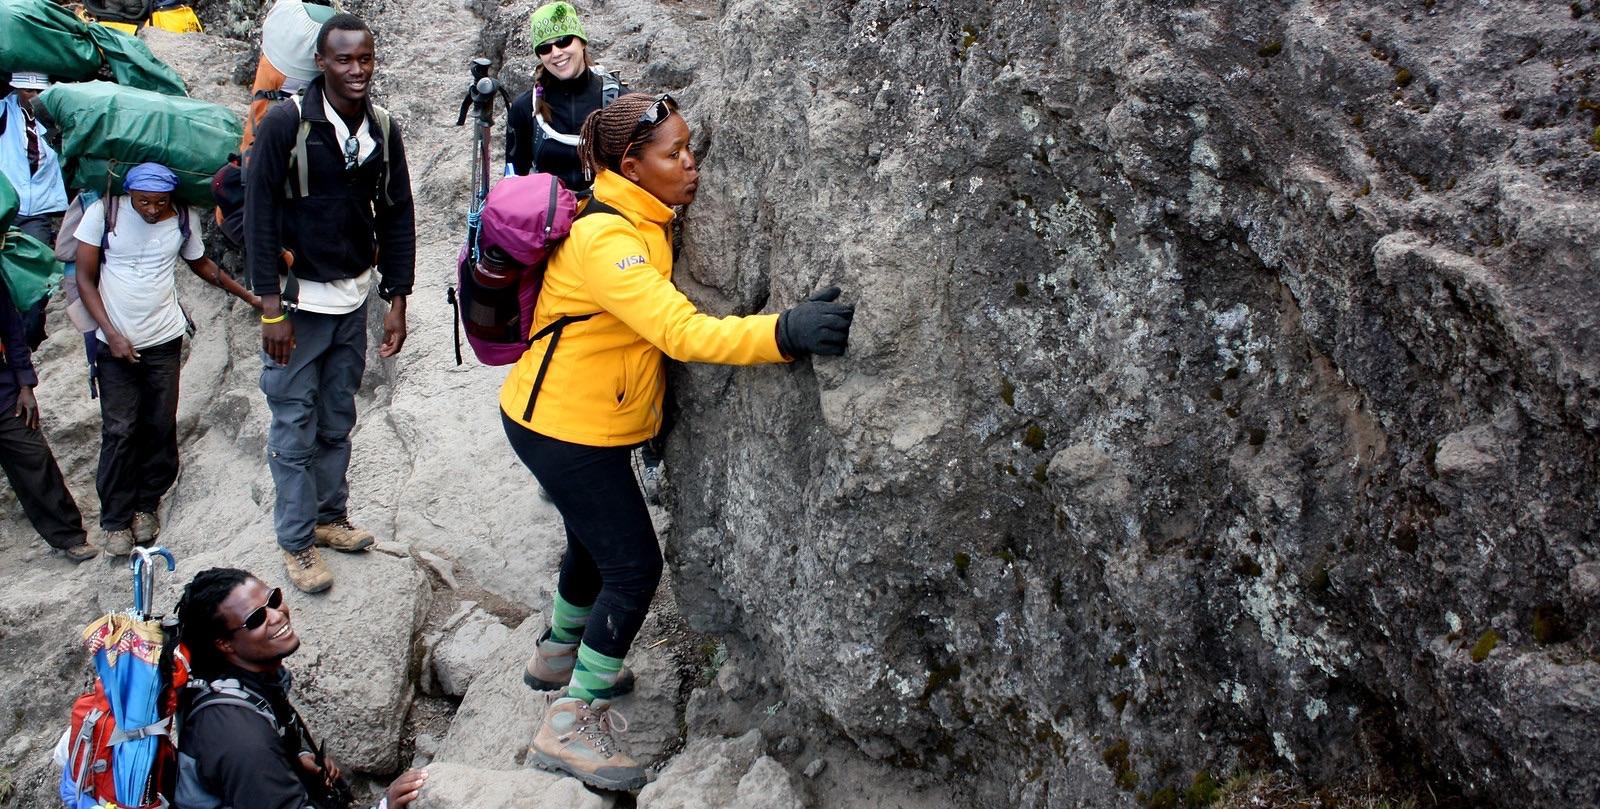 Barranco wall kissing rock